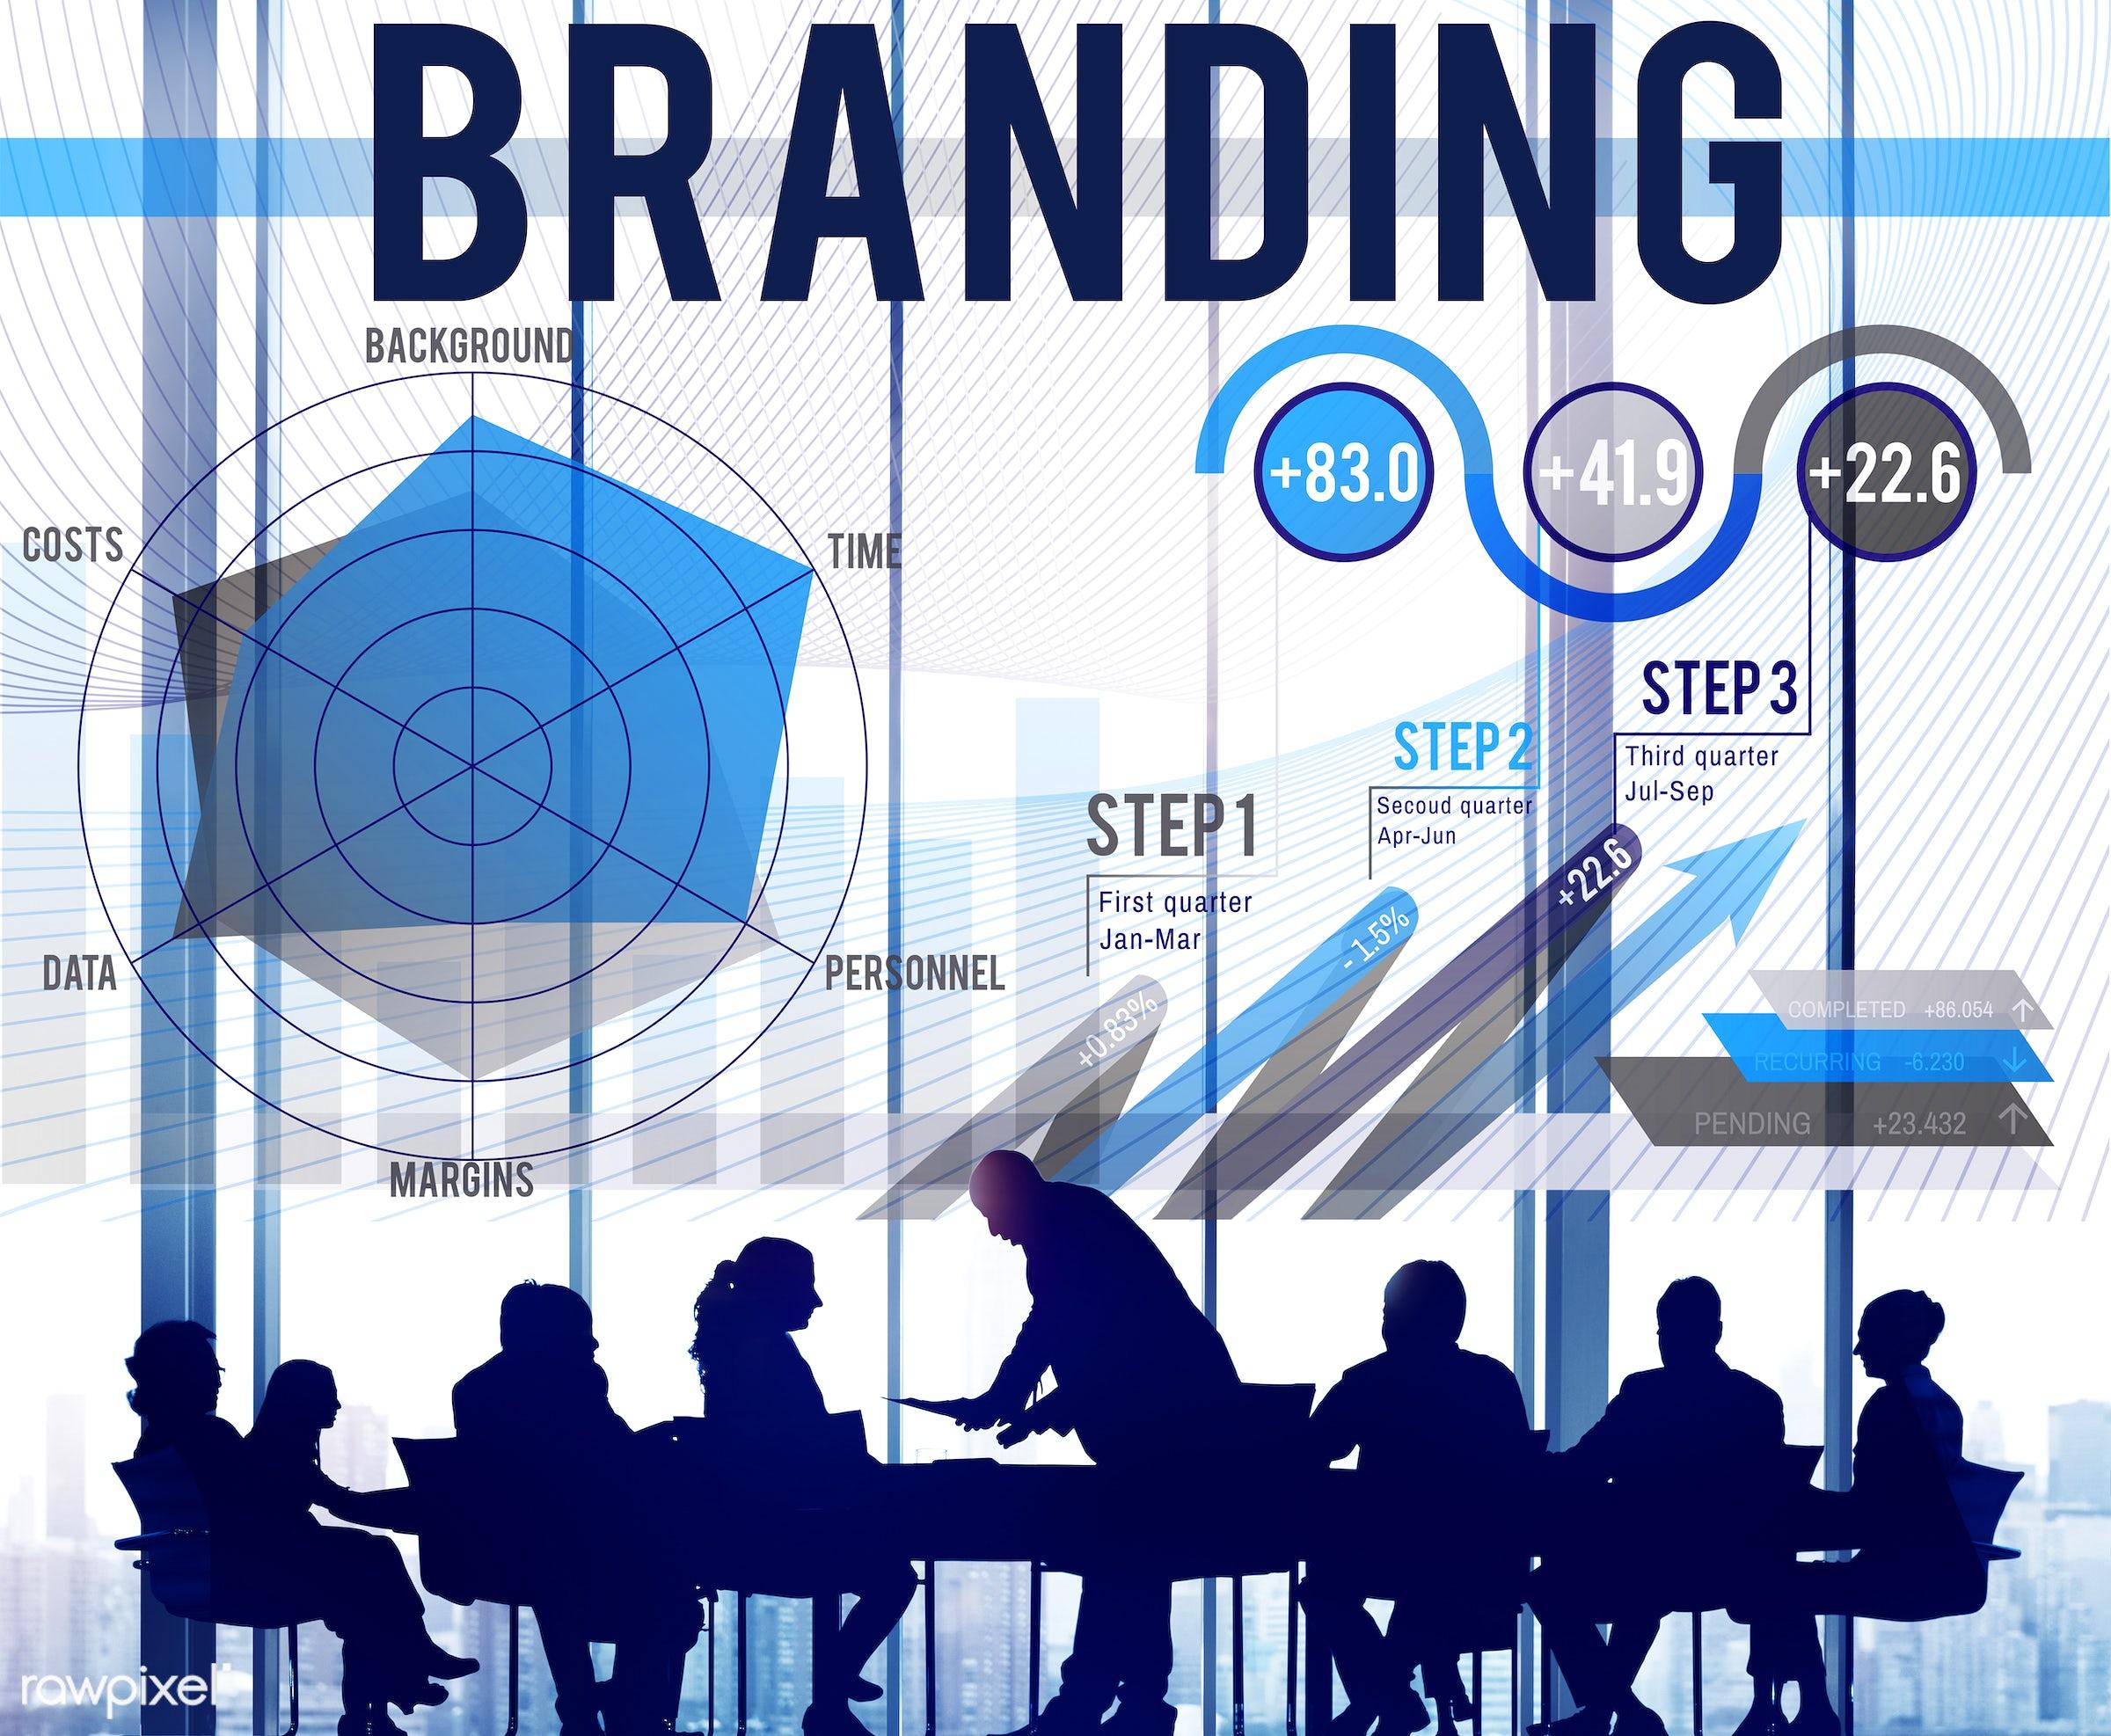 business, planning, advertising, analysis, badge, banner, brainstorming, brand, brand name, branding, business people,...